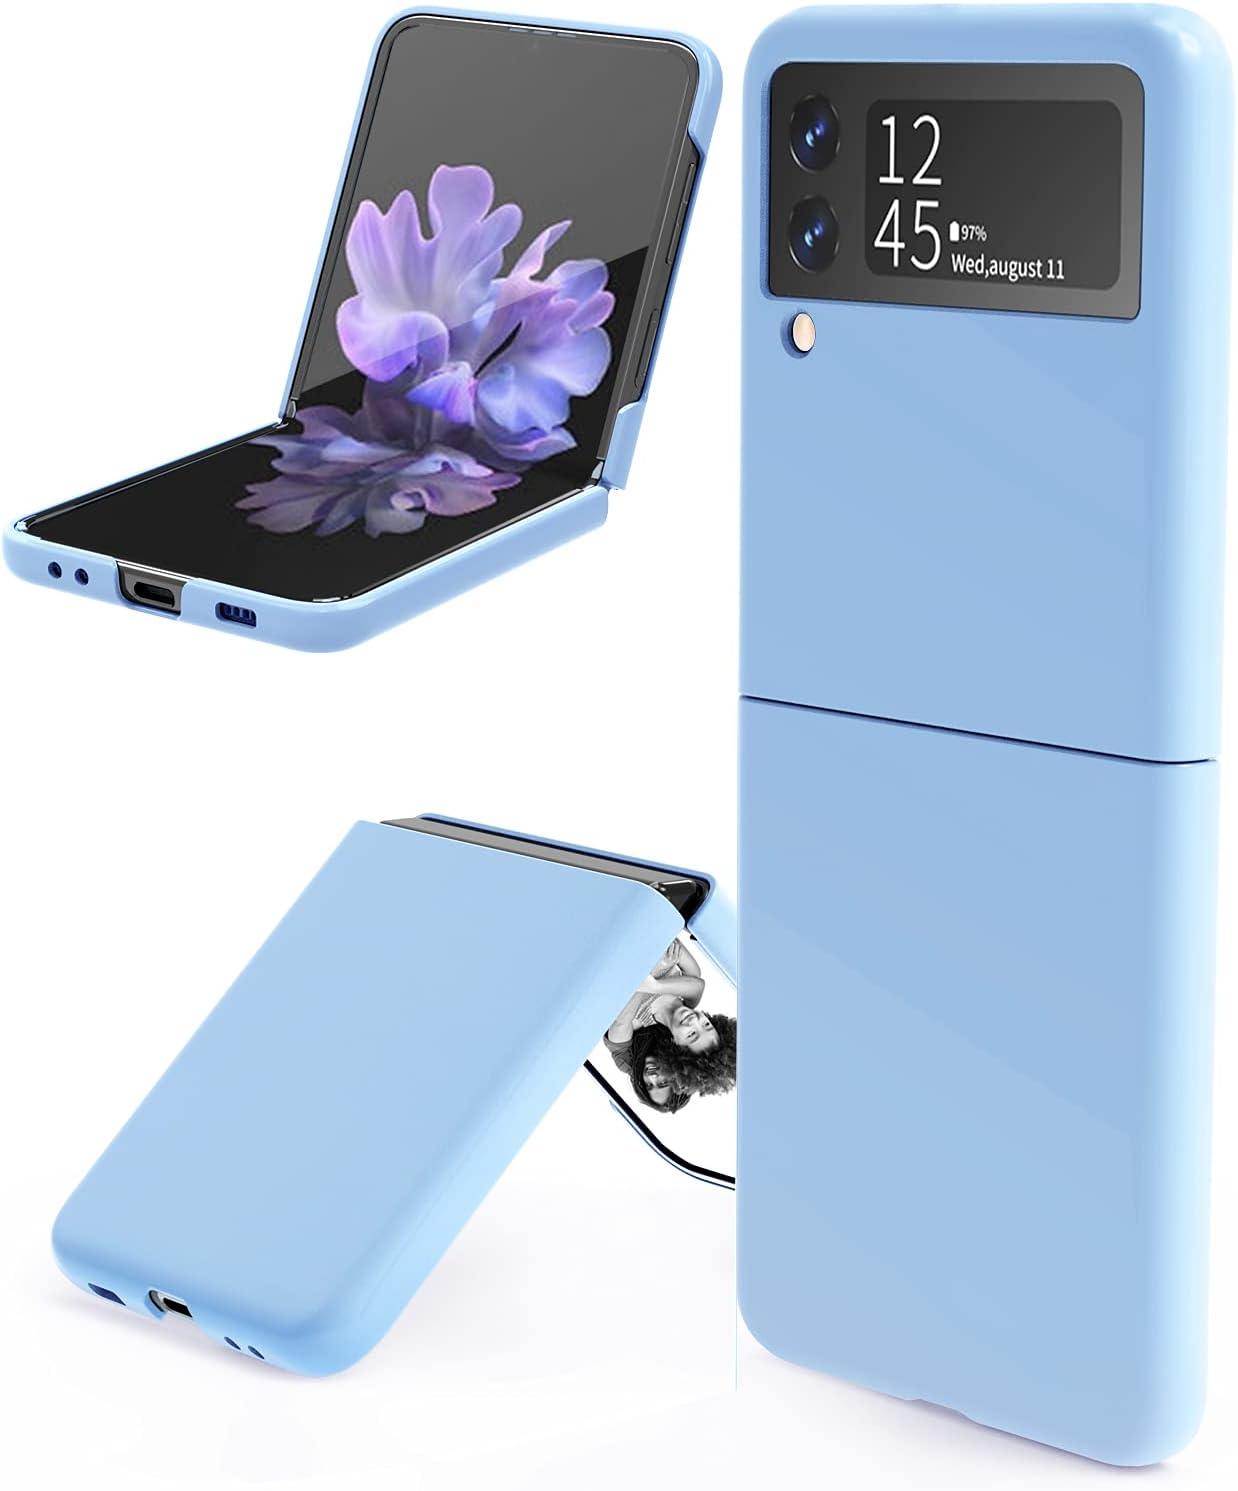 leChivée for Samsung Galaxy Z Flip 3 5G Case, Slim Durable Galaxy Z Flip 3 Phone Case Anti-Drop Wear-Resistant Hard PC Protective Cover for Samsung Z Flip 3 5G (Blue)